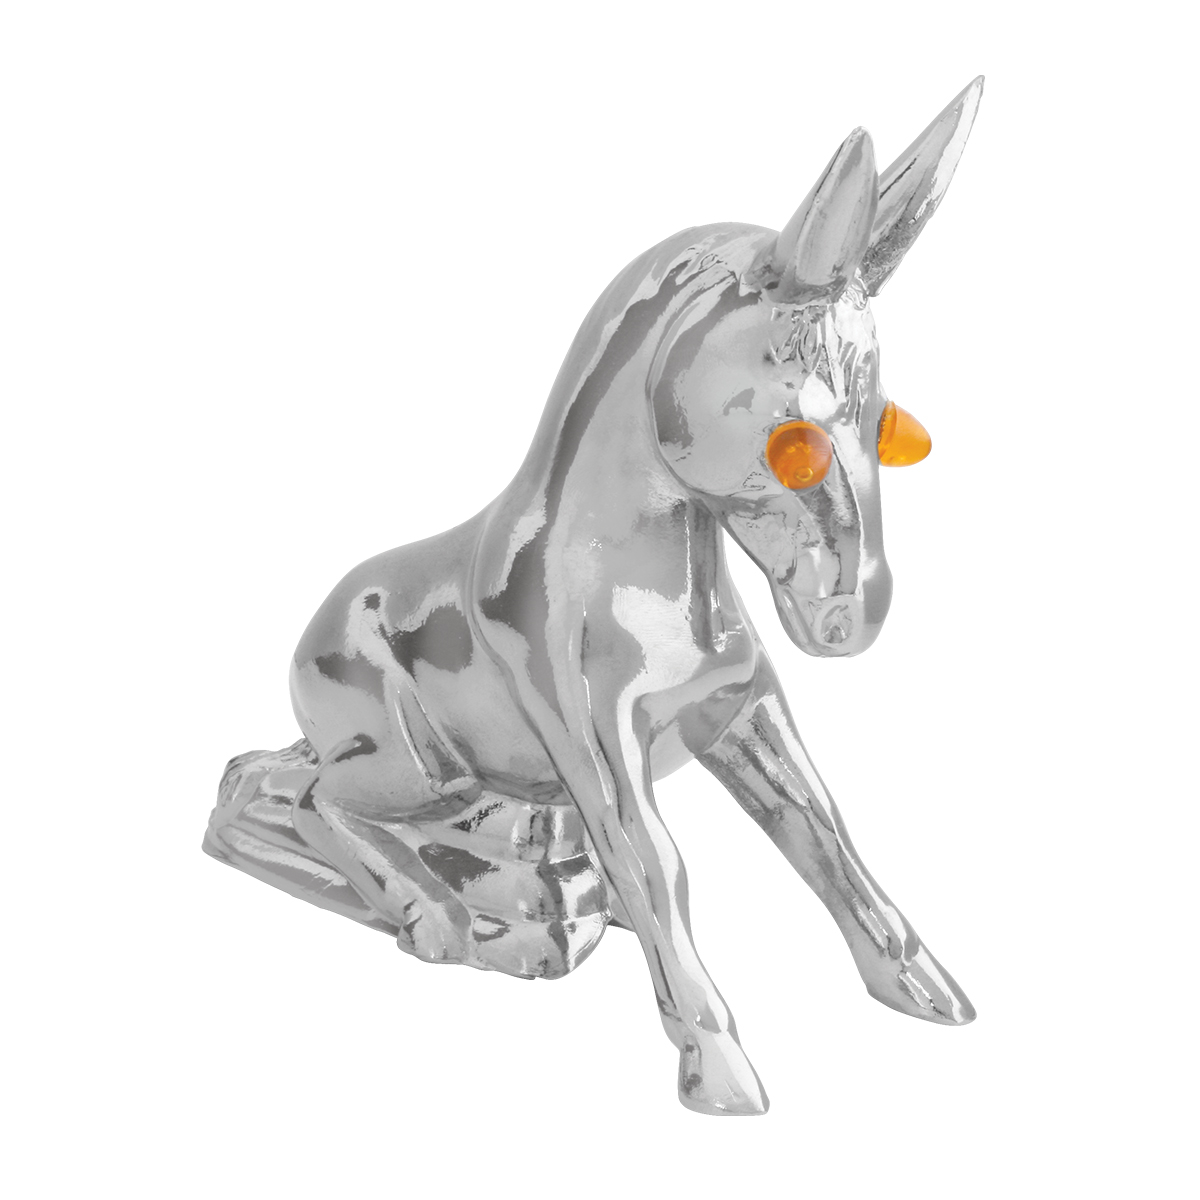 Donkey ornaments - Chrome Die Cast Novelty Donkey W Illuminated Eyes Eyes Unlit